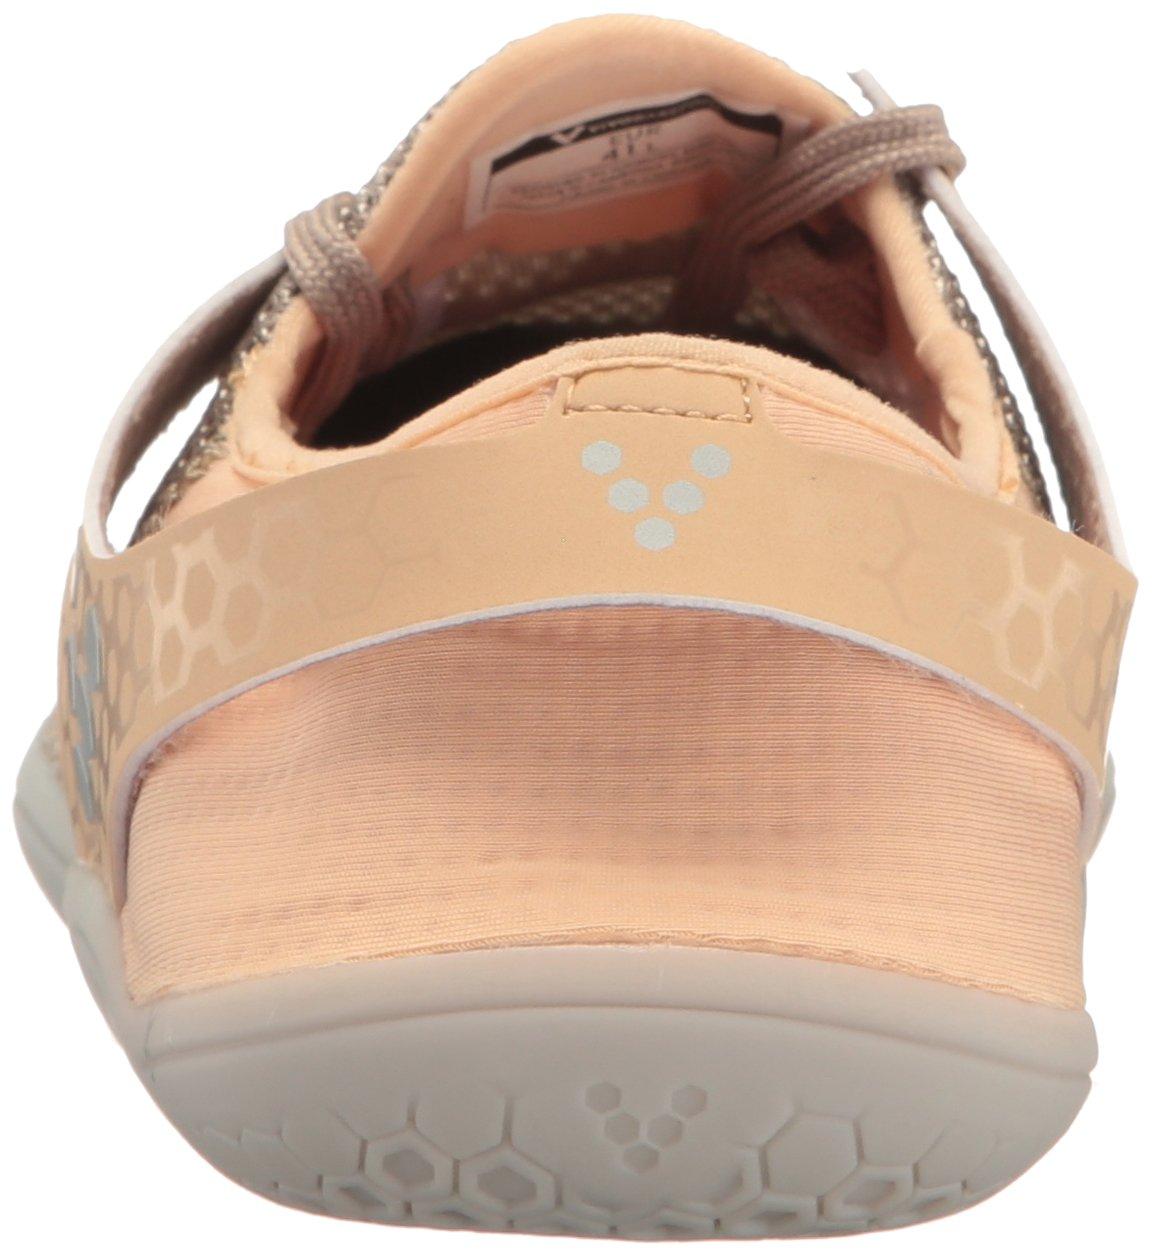 Vivobarefoot Women's Wing Minimalist Yoga Walking-Shoes B01N9SRBRO 42 D EU (11 US)|Cobblestone